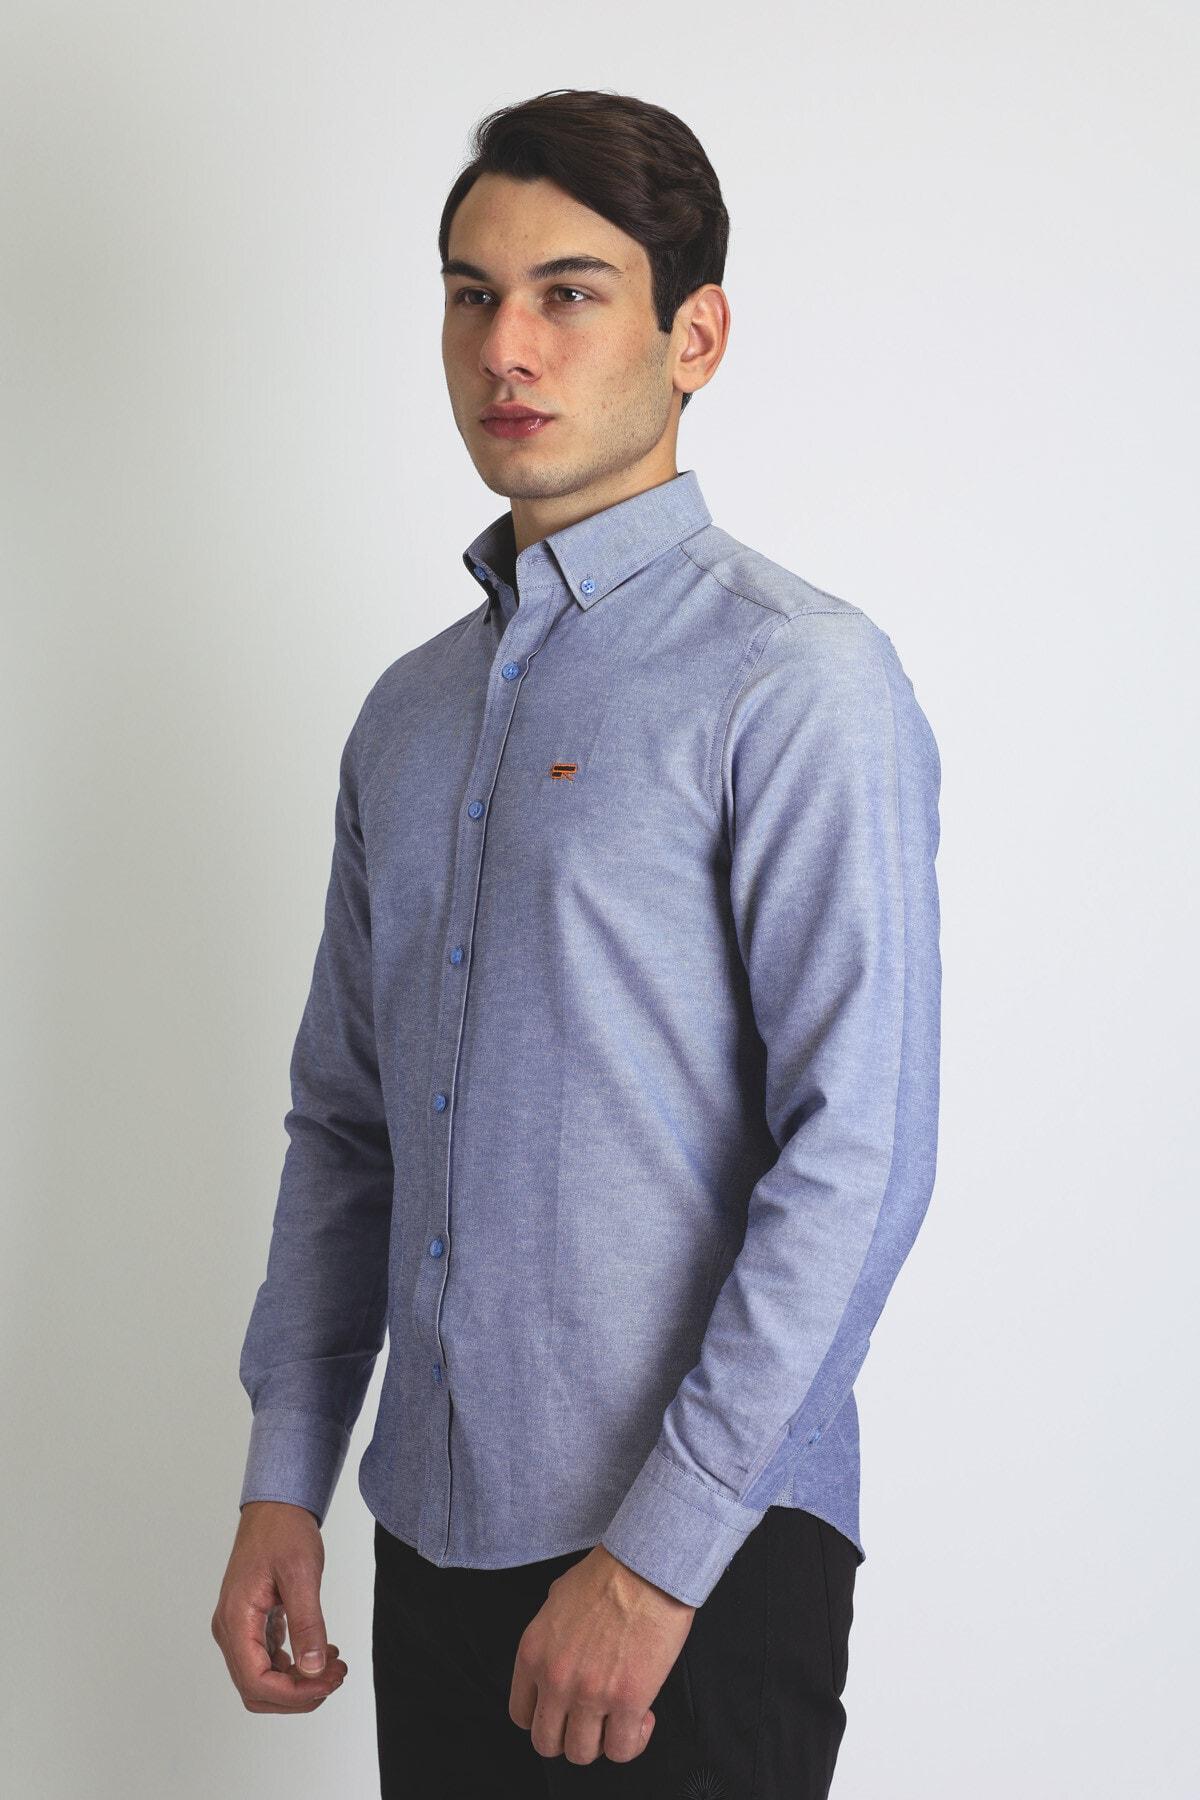 BEARRAYBON Erkek Mavi Pamuk Gömlek 2